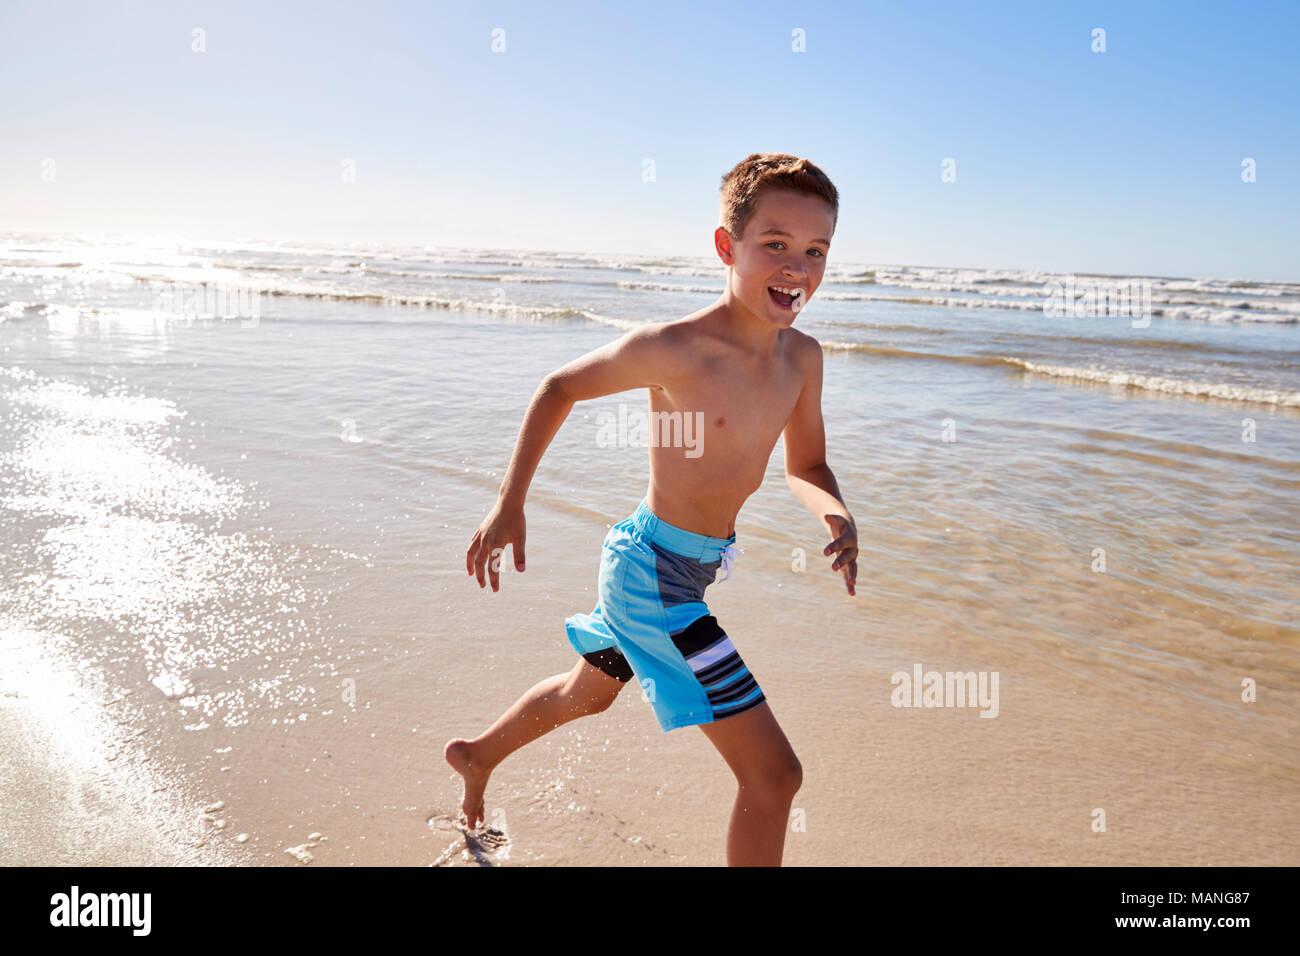 Portrait Of Boy Running Through Waves On Summer Vacation Stock Photo